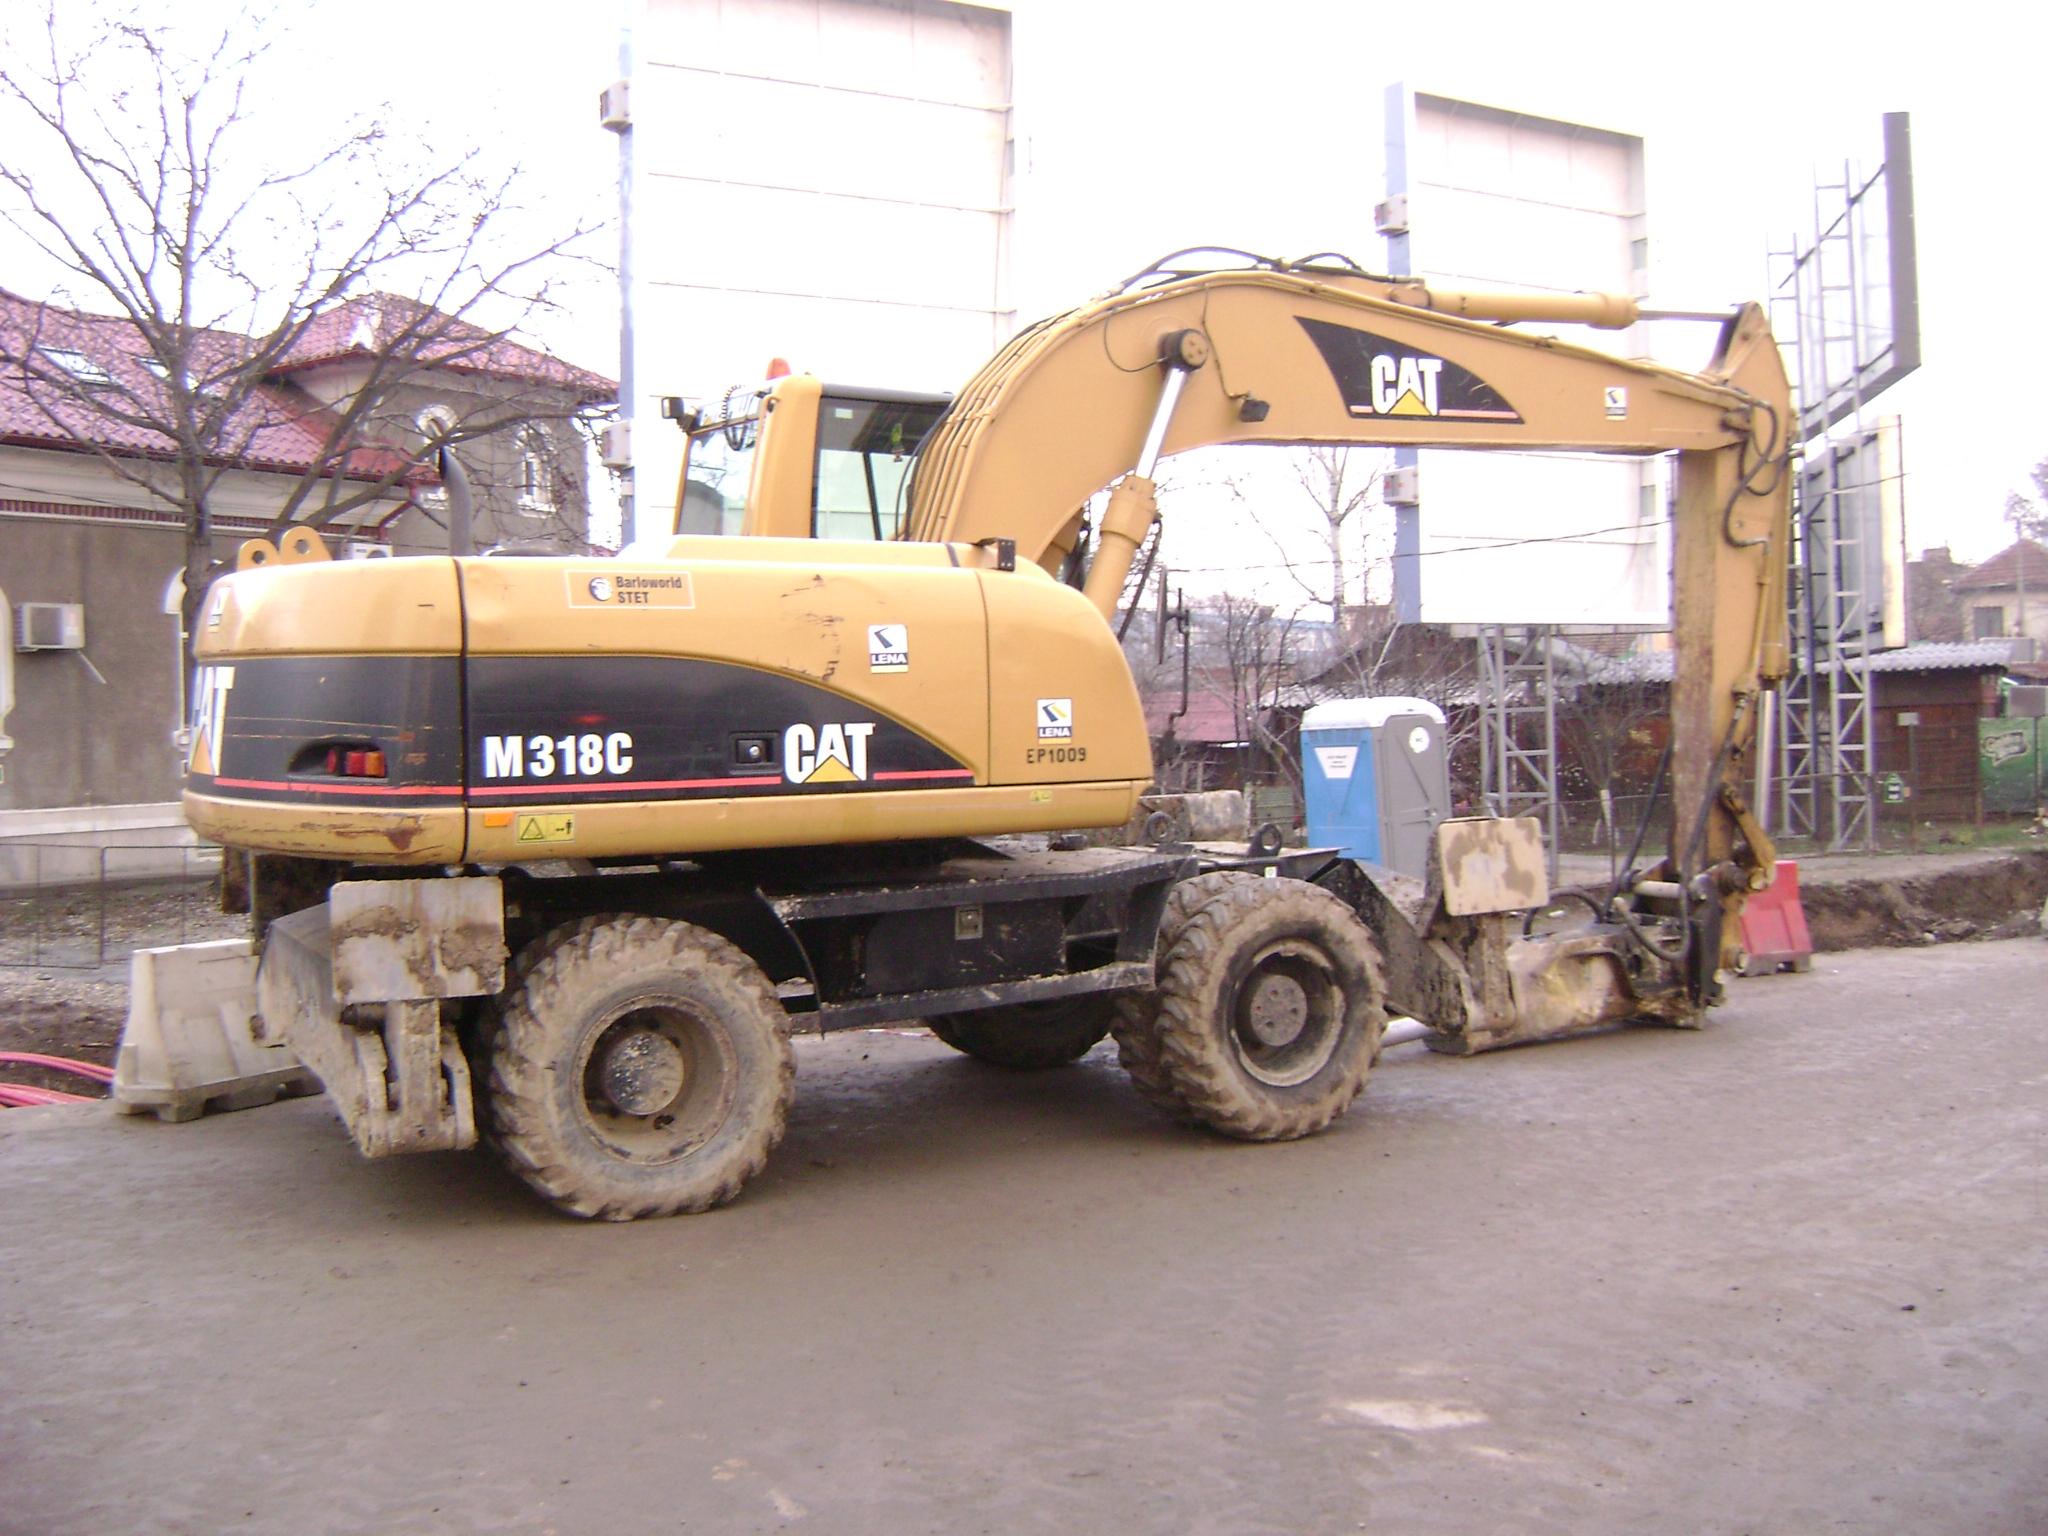 File:Caterpillar M318C wheeled excavator with hydraulic ... on